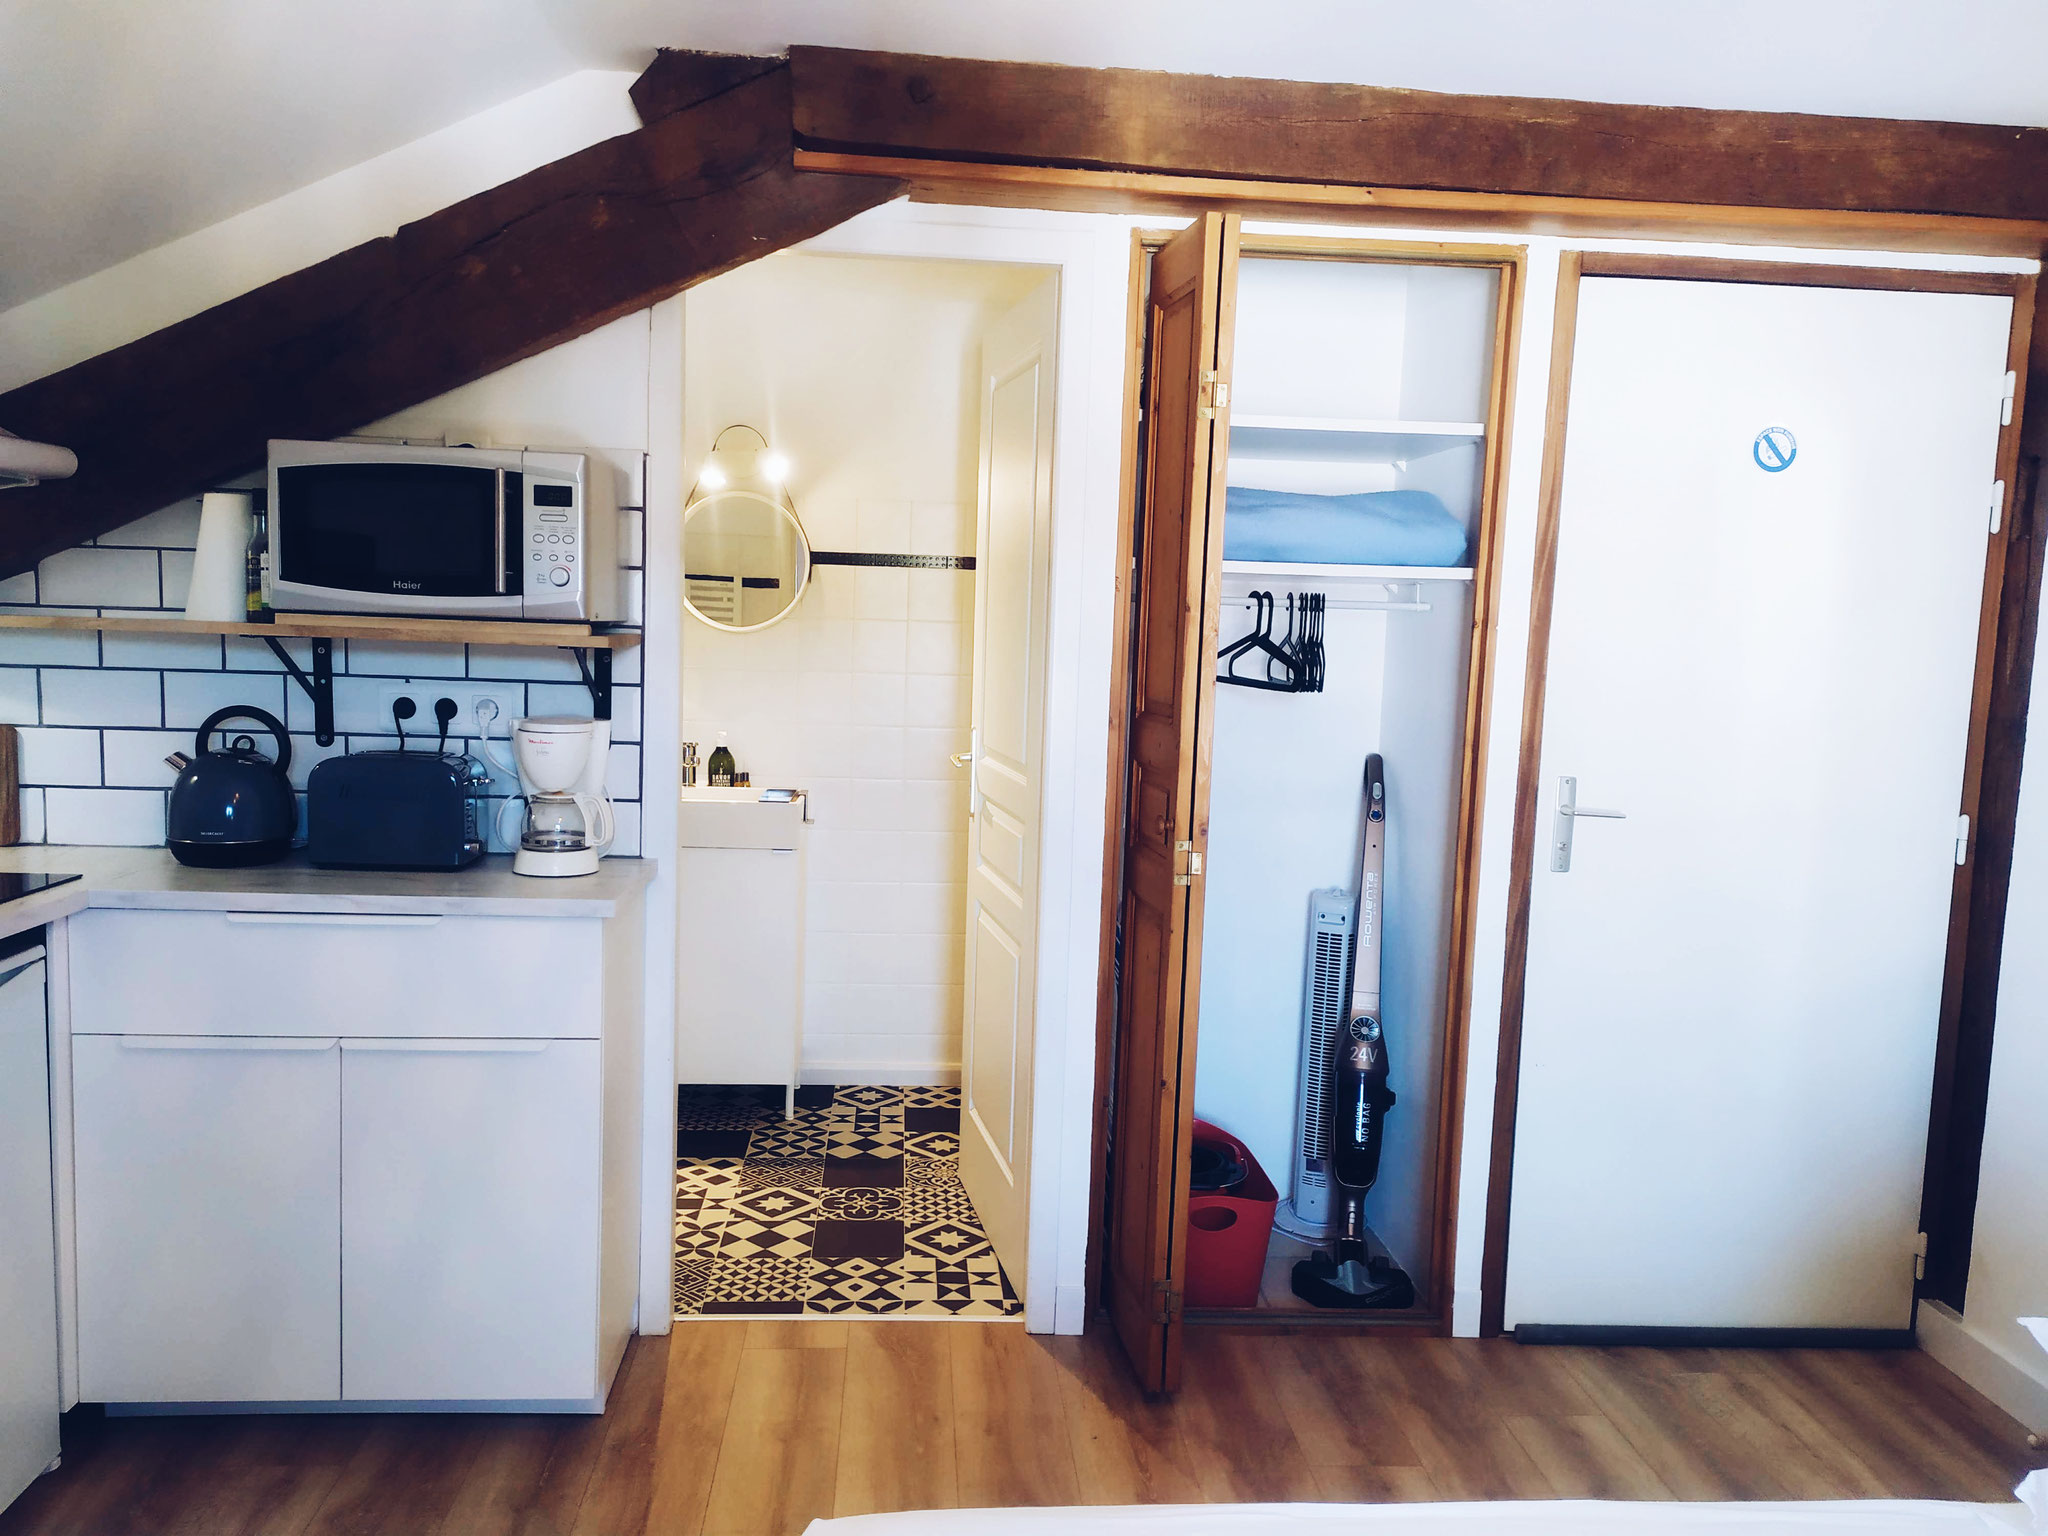 Harrikoa - location de vacances au pays basque - maison garroenea - sare